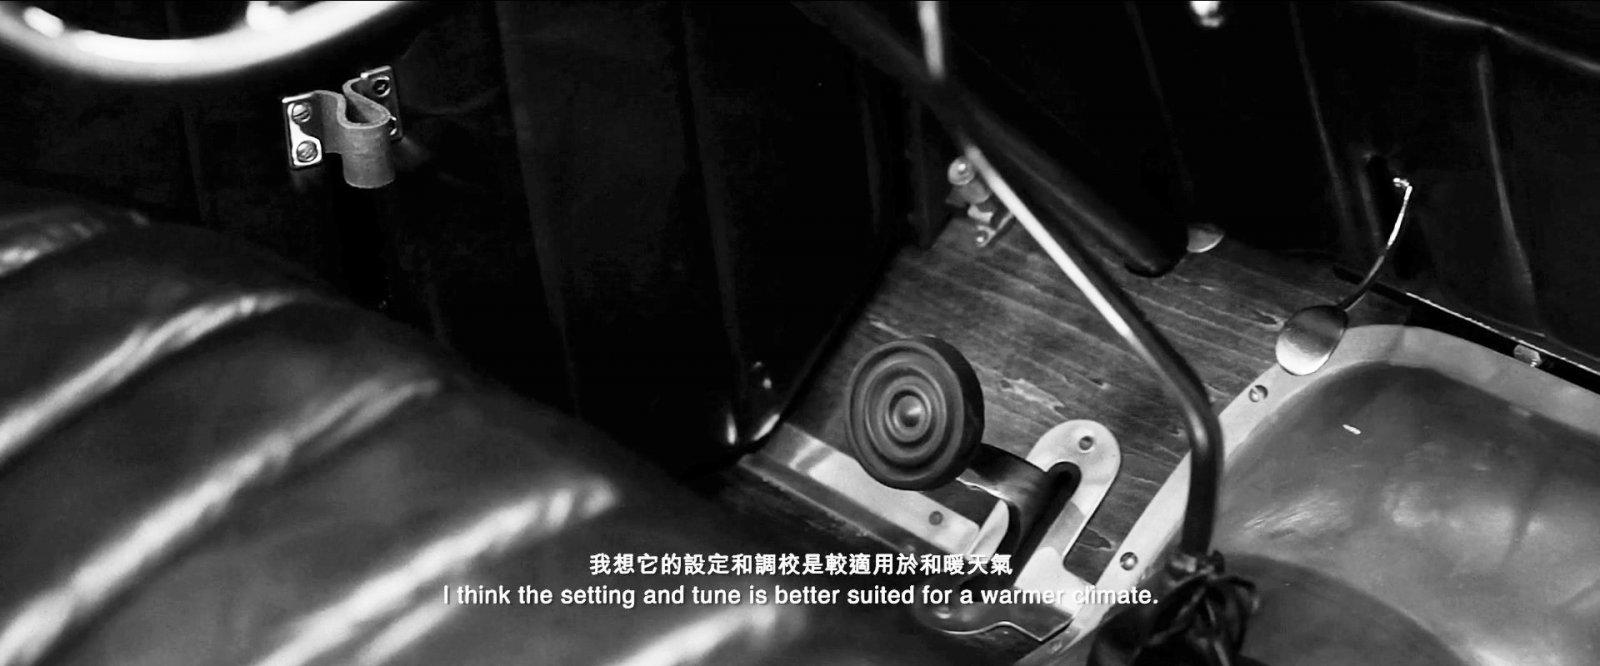 no third pedal.jpg